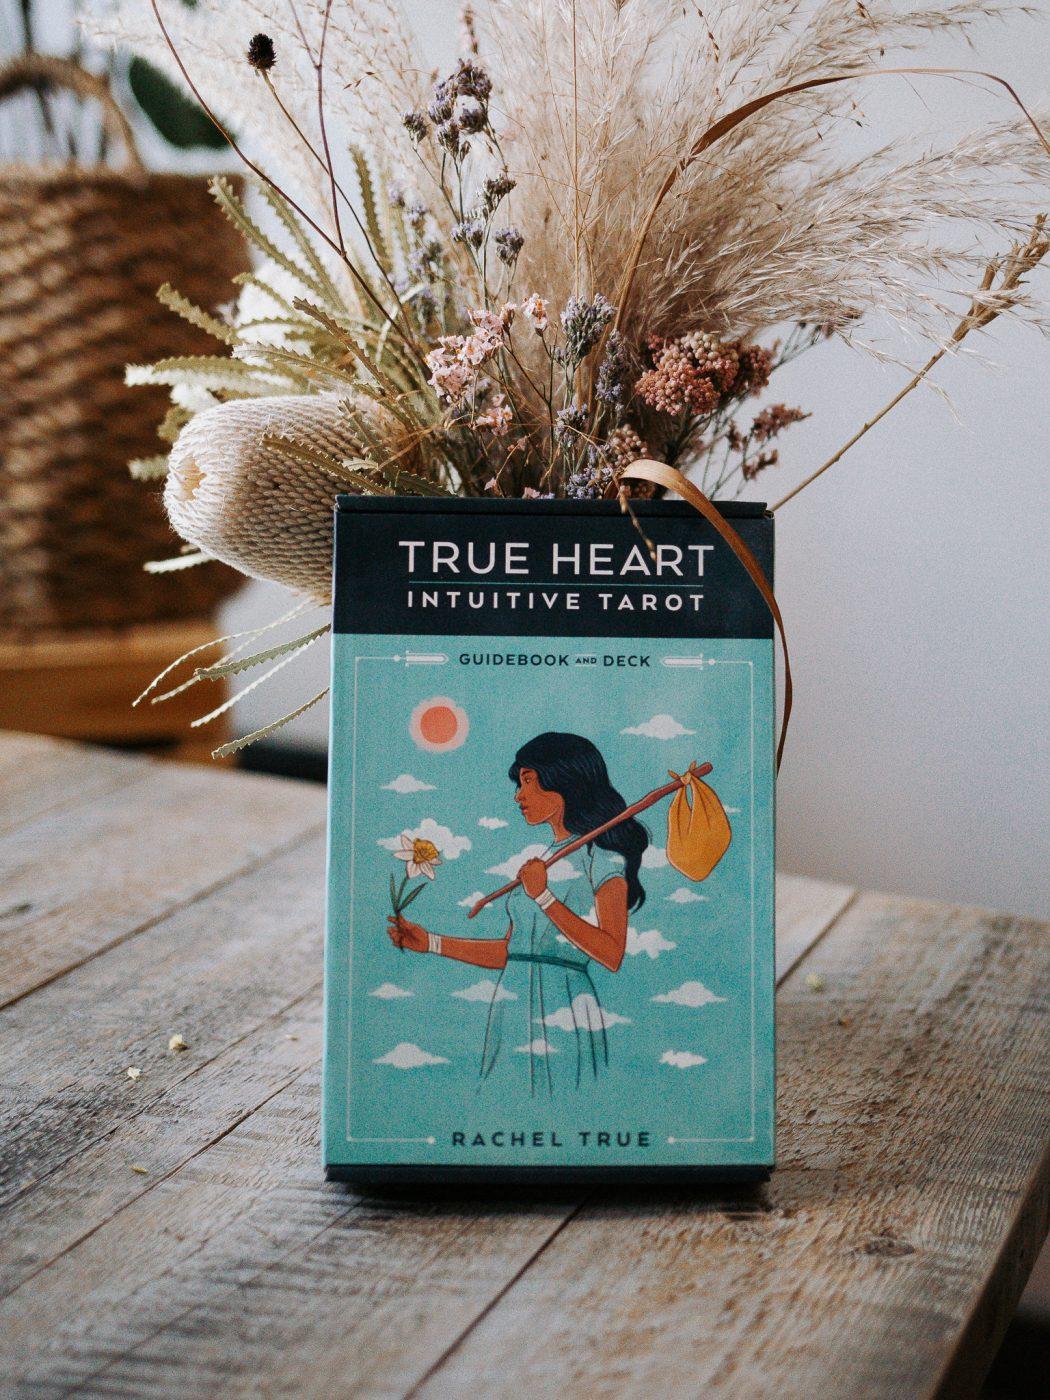 True Heart Intuitive Tarot by Rachel True